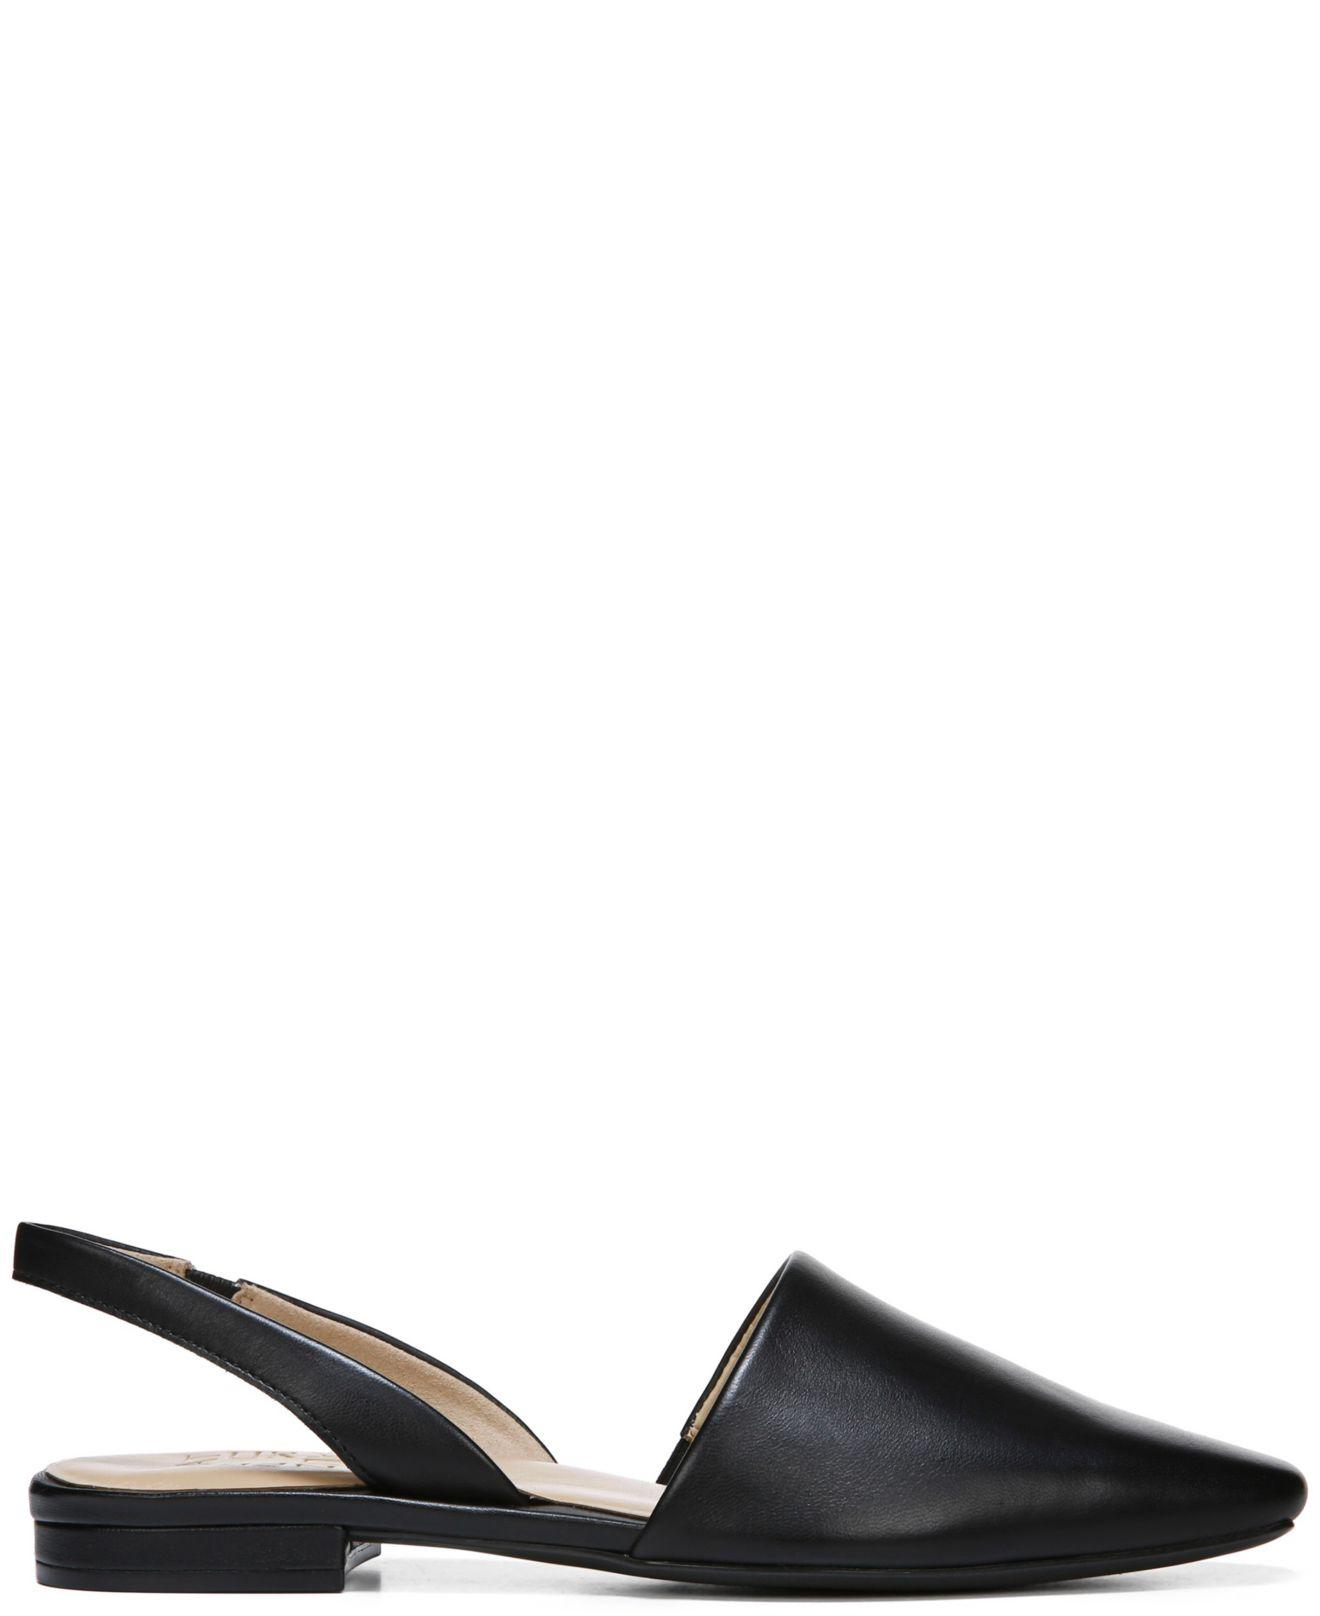 Kerrie Slingback Flats in Black Leather